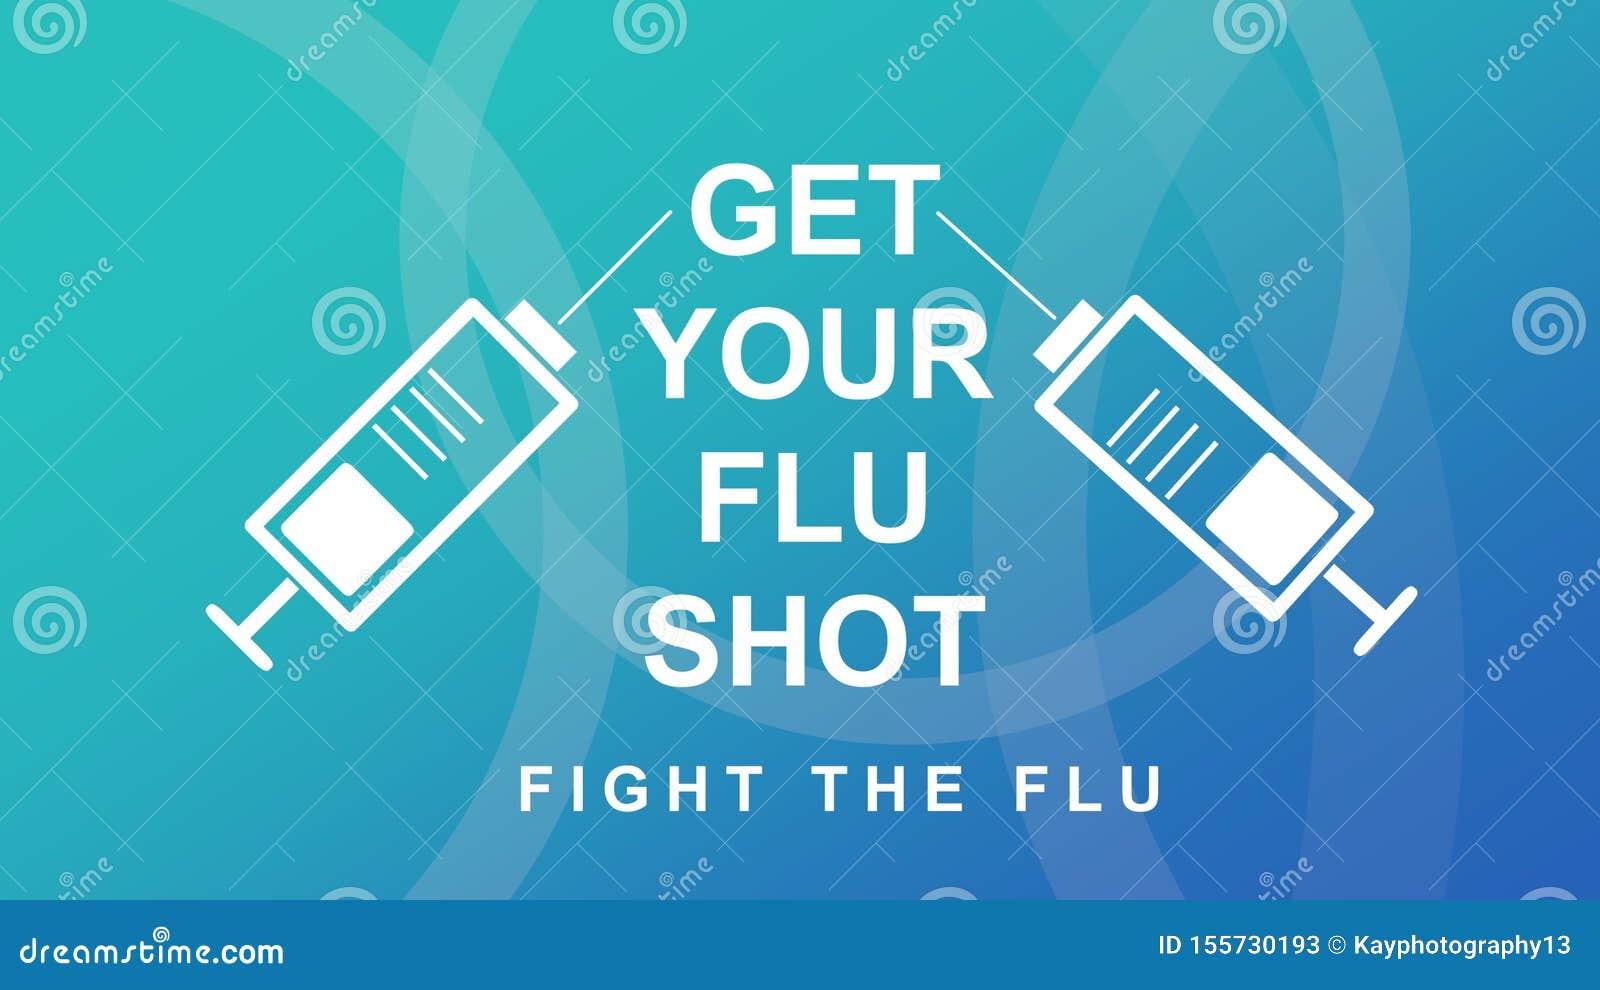 Flu Awareness Campaign Banner Design Illustration Stock Illustration Illustration Of Illustrations Campaign 155730193